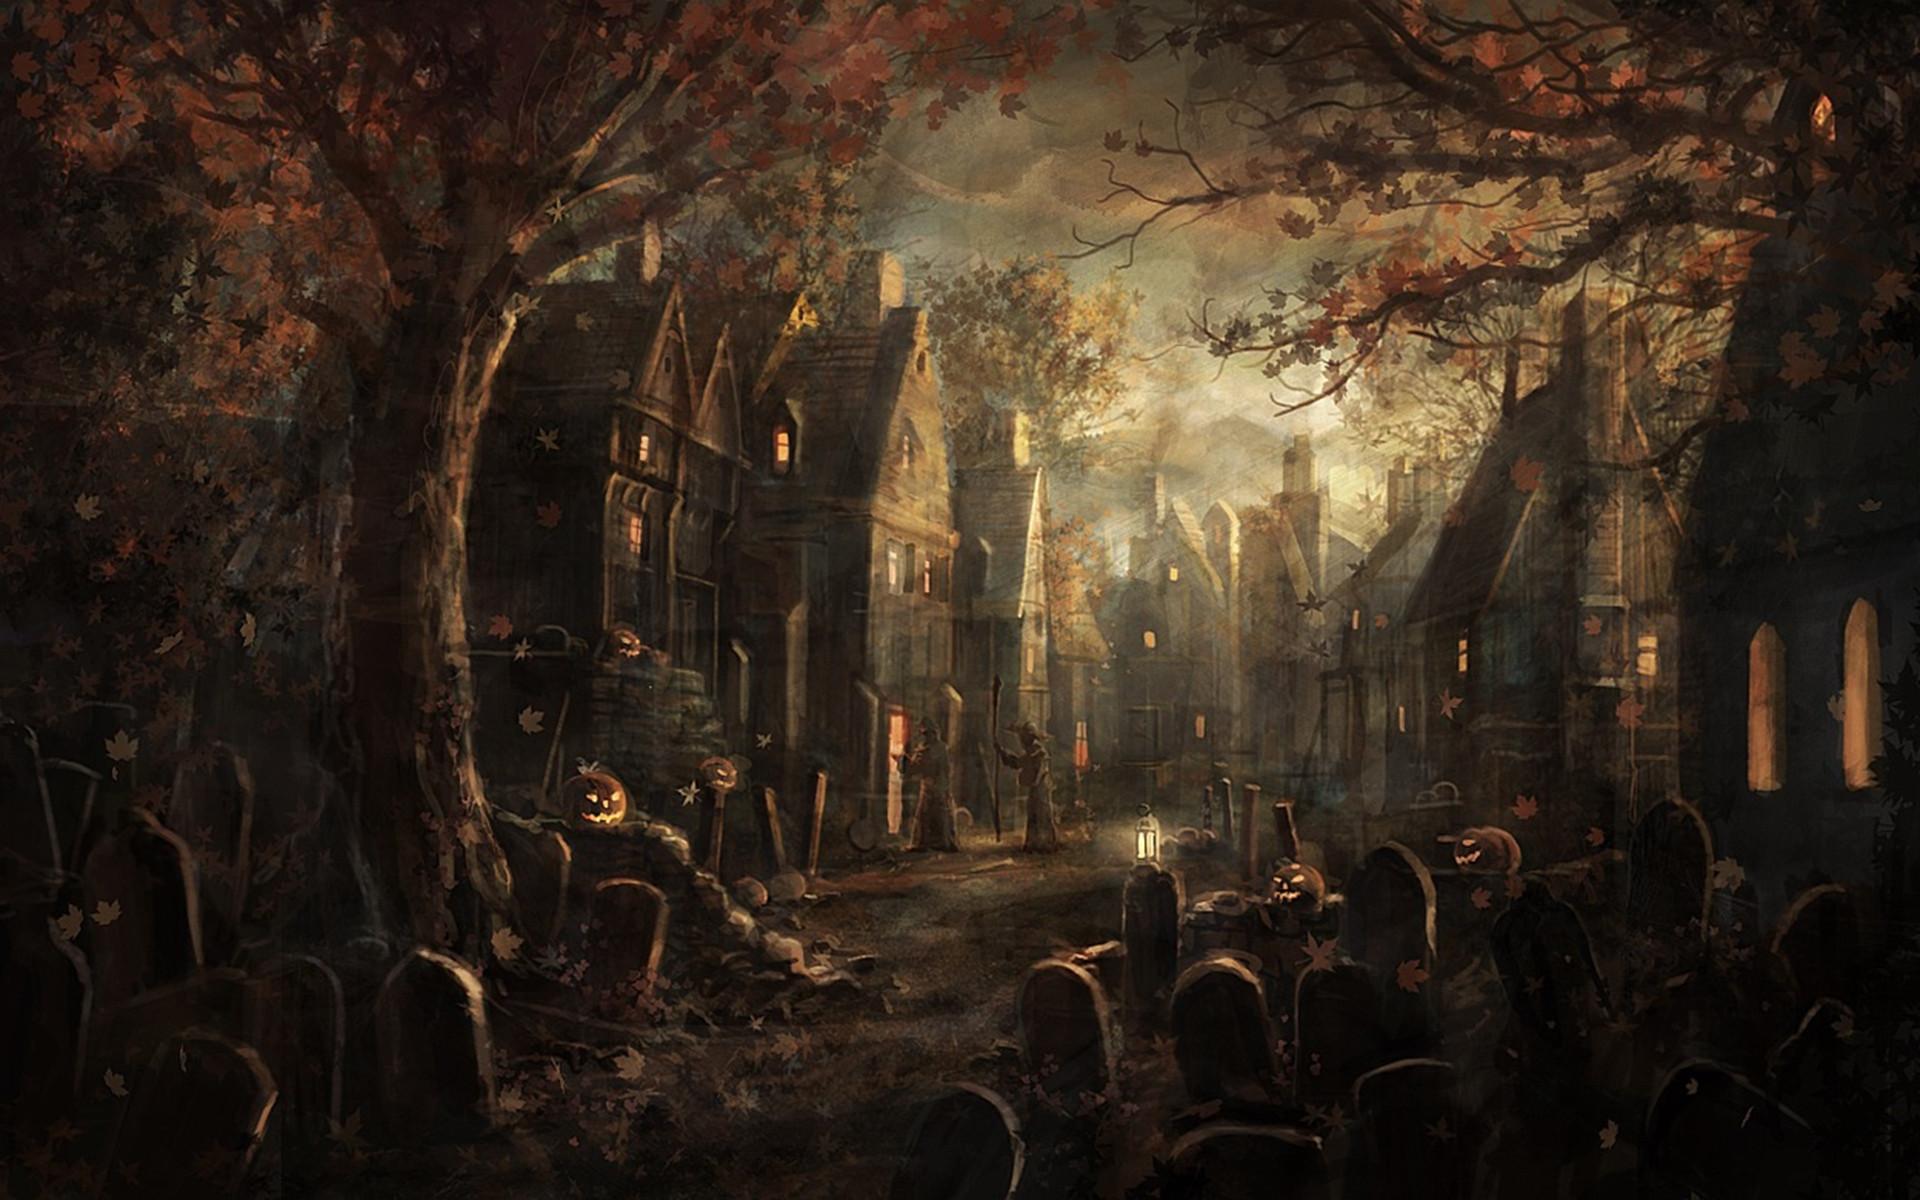 Hd elegant halloween background 2015 – Hd Elegant Halloween Backgrounds  2015 Desktop Background